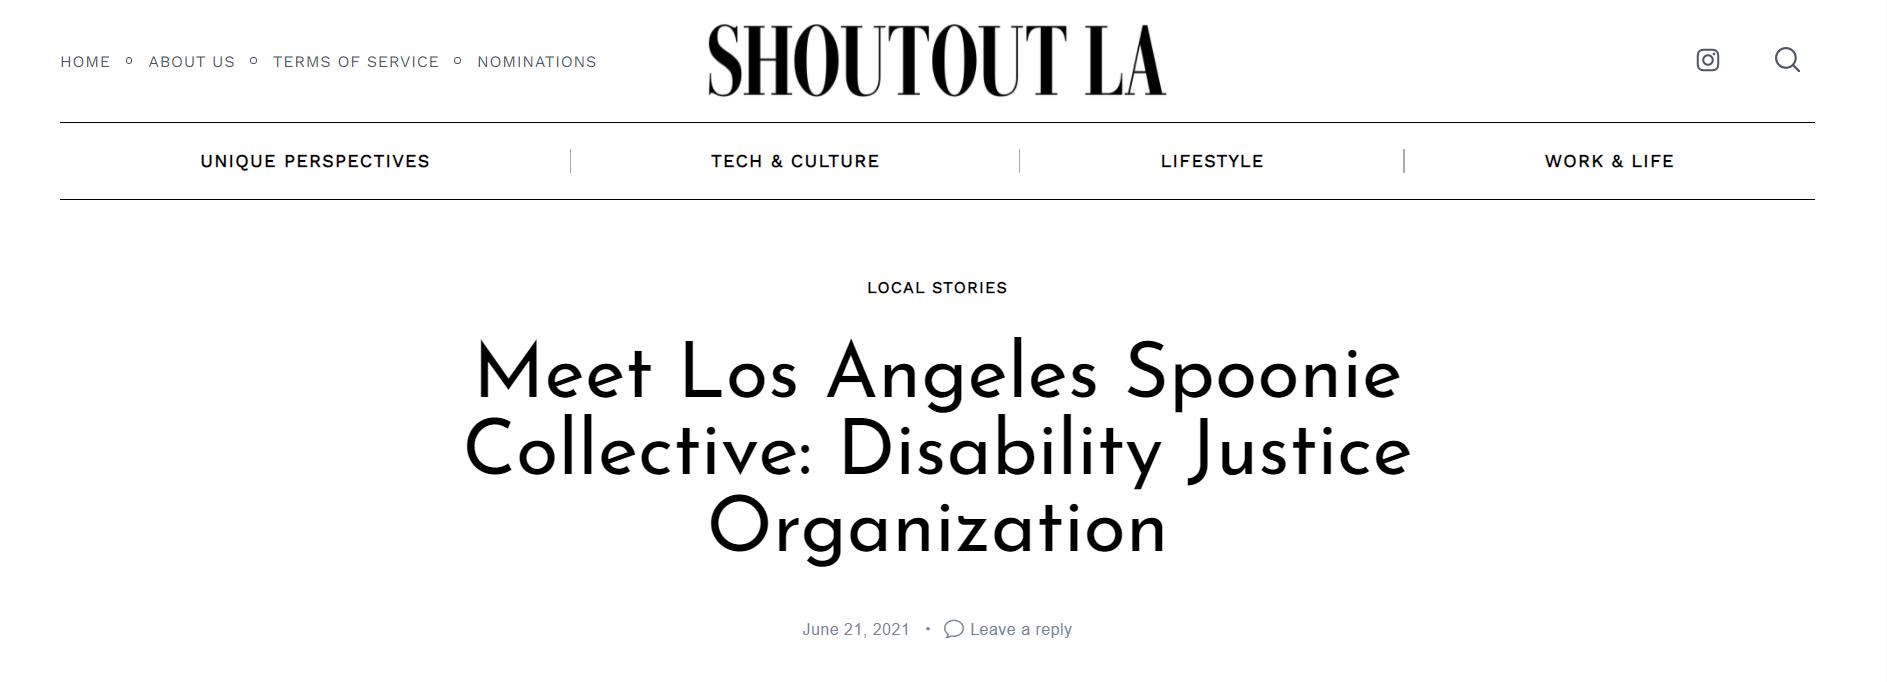 Shoutout LA - Meet Los Angeles Spoonie Collective: Disability Justice Organization